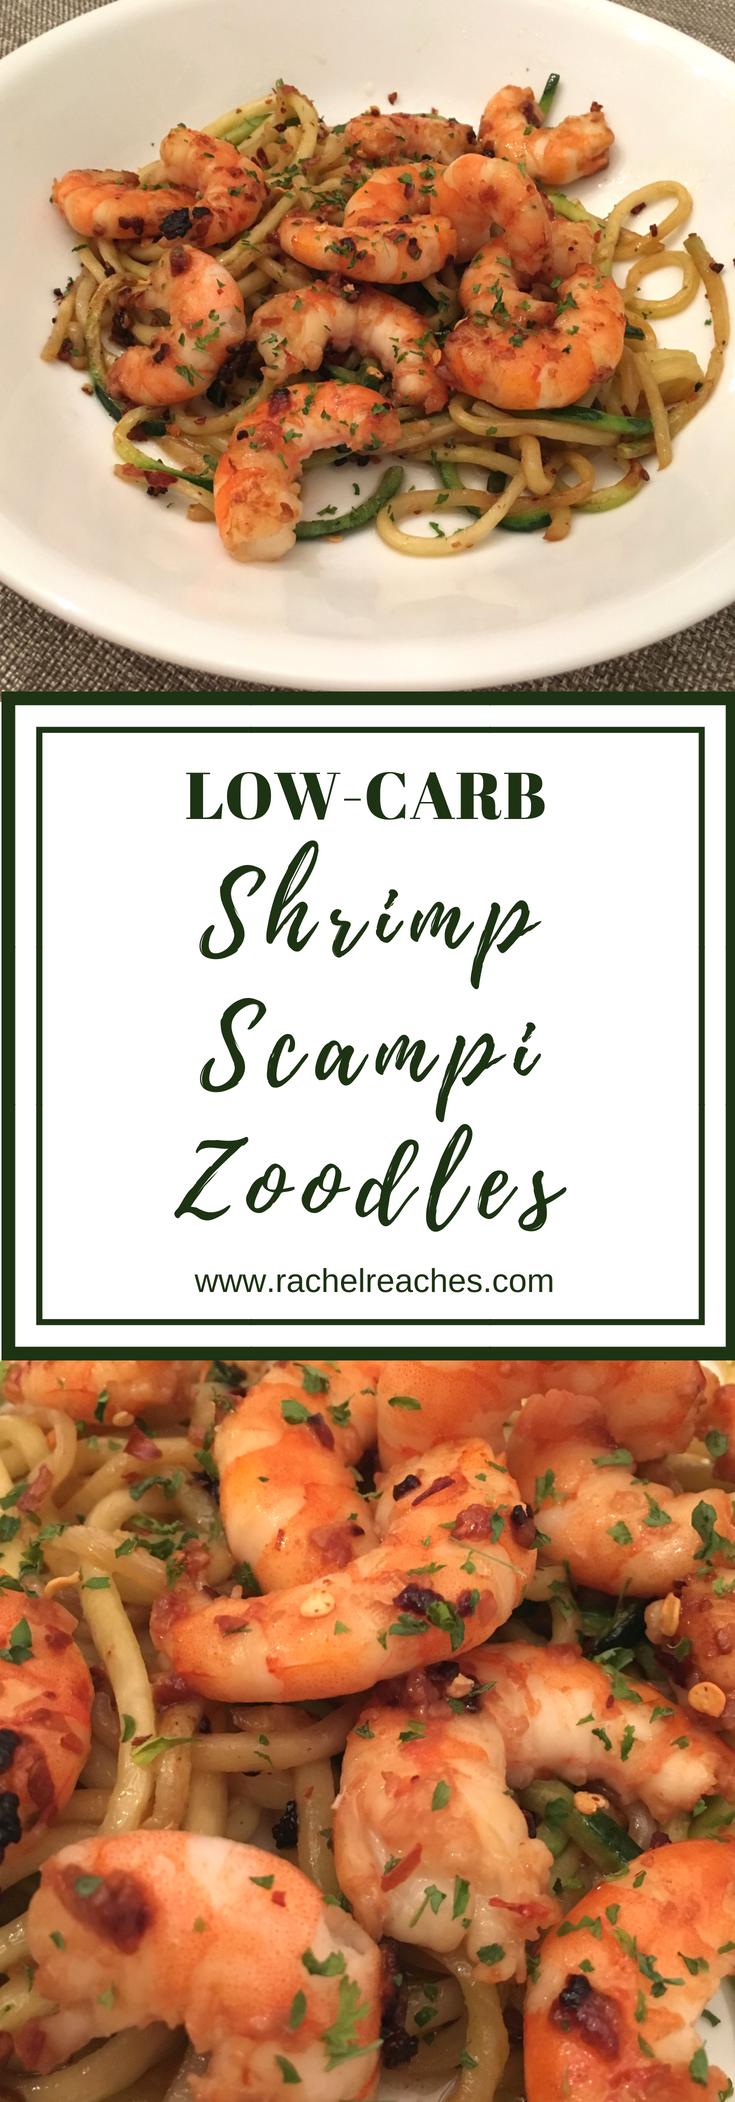 Shrimp Scampi Zoodles - Healthy Recipes.png